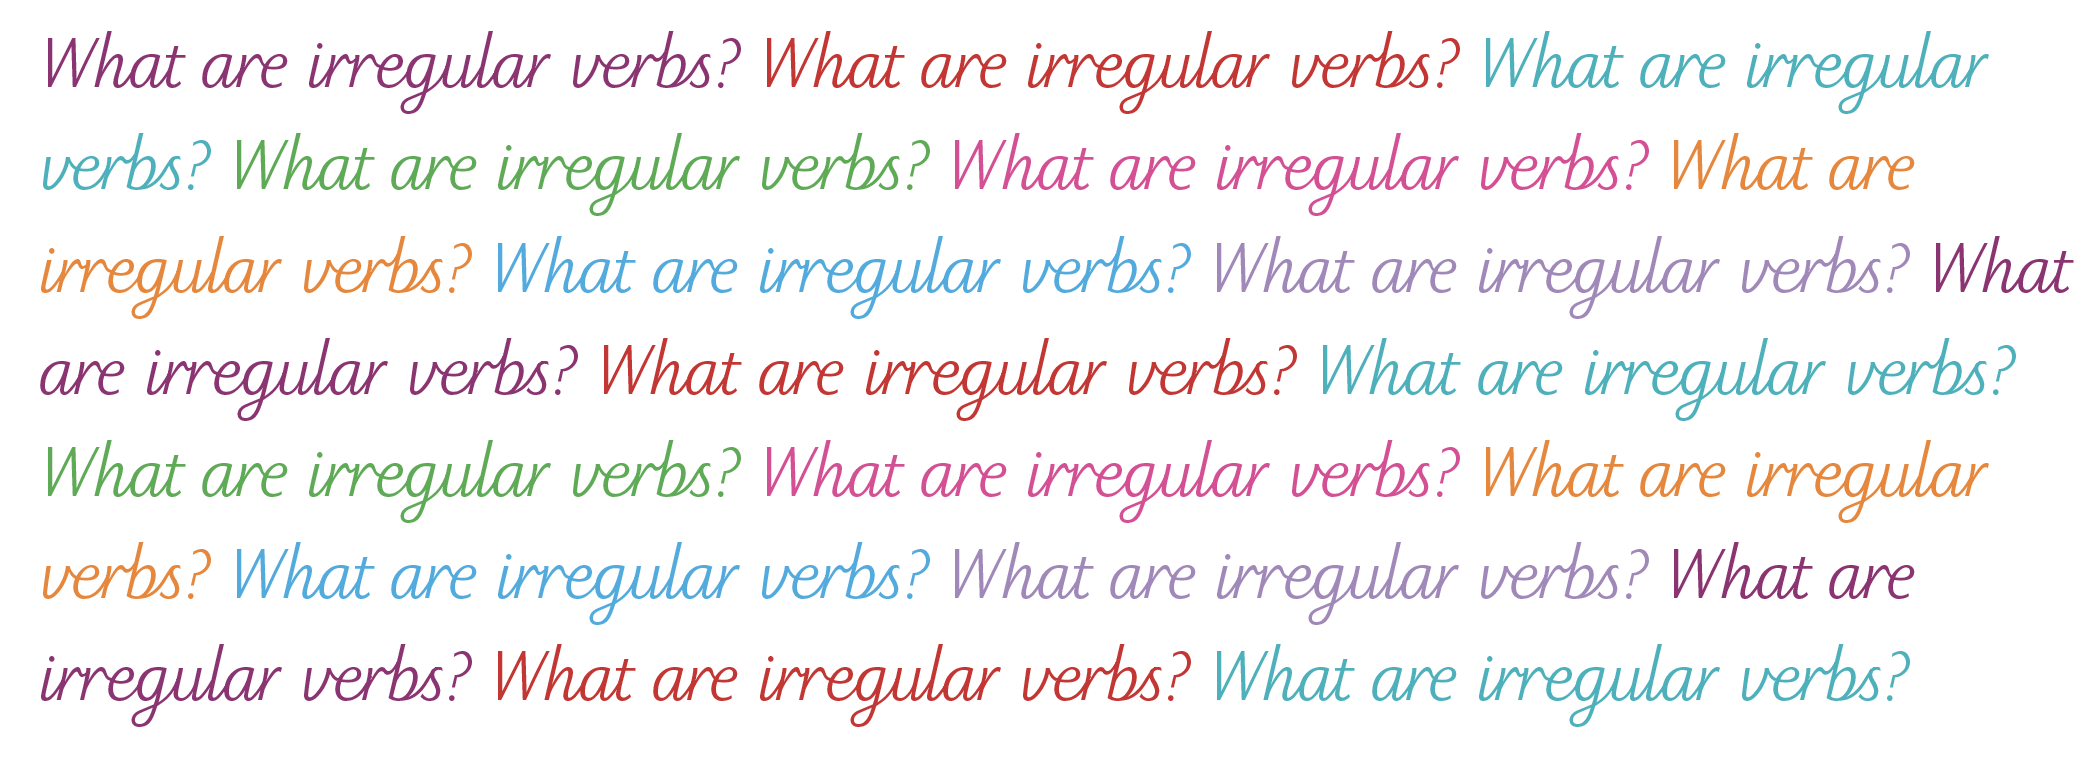 english irregular verbs explained irregular verbs in ks2 irregular verbs in primary. Black Bedroom Furniture Sets. Home Design Ideas